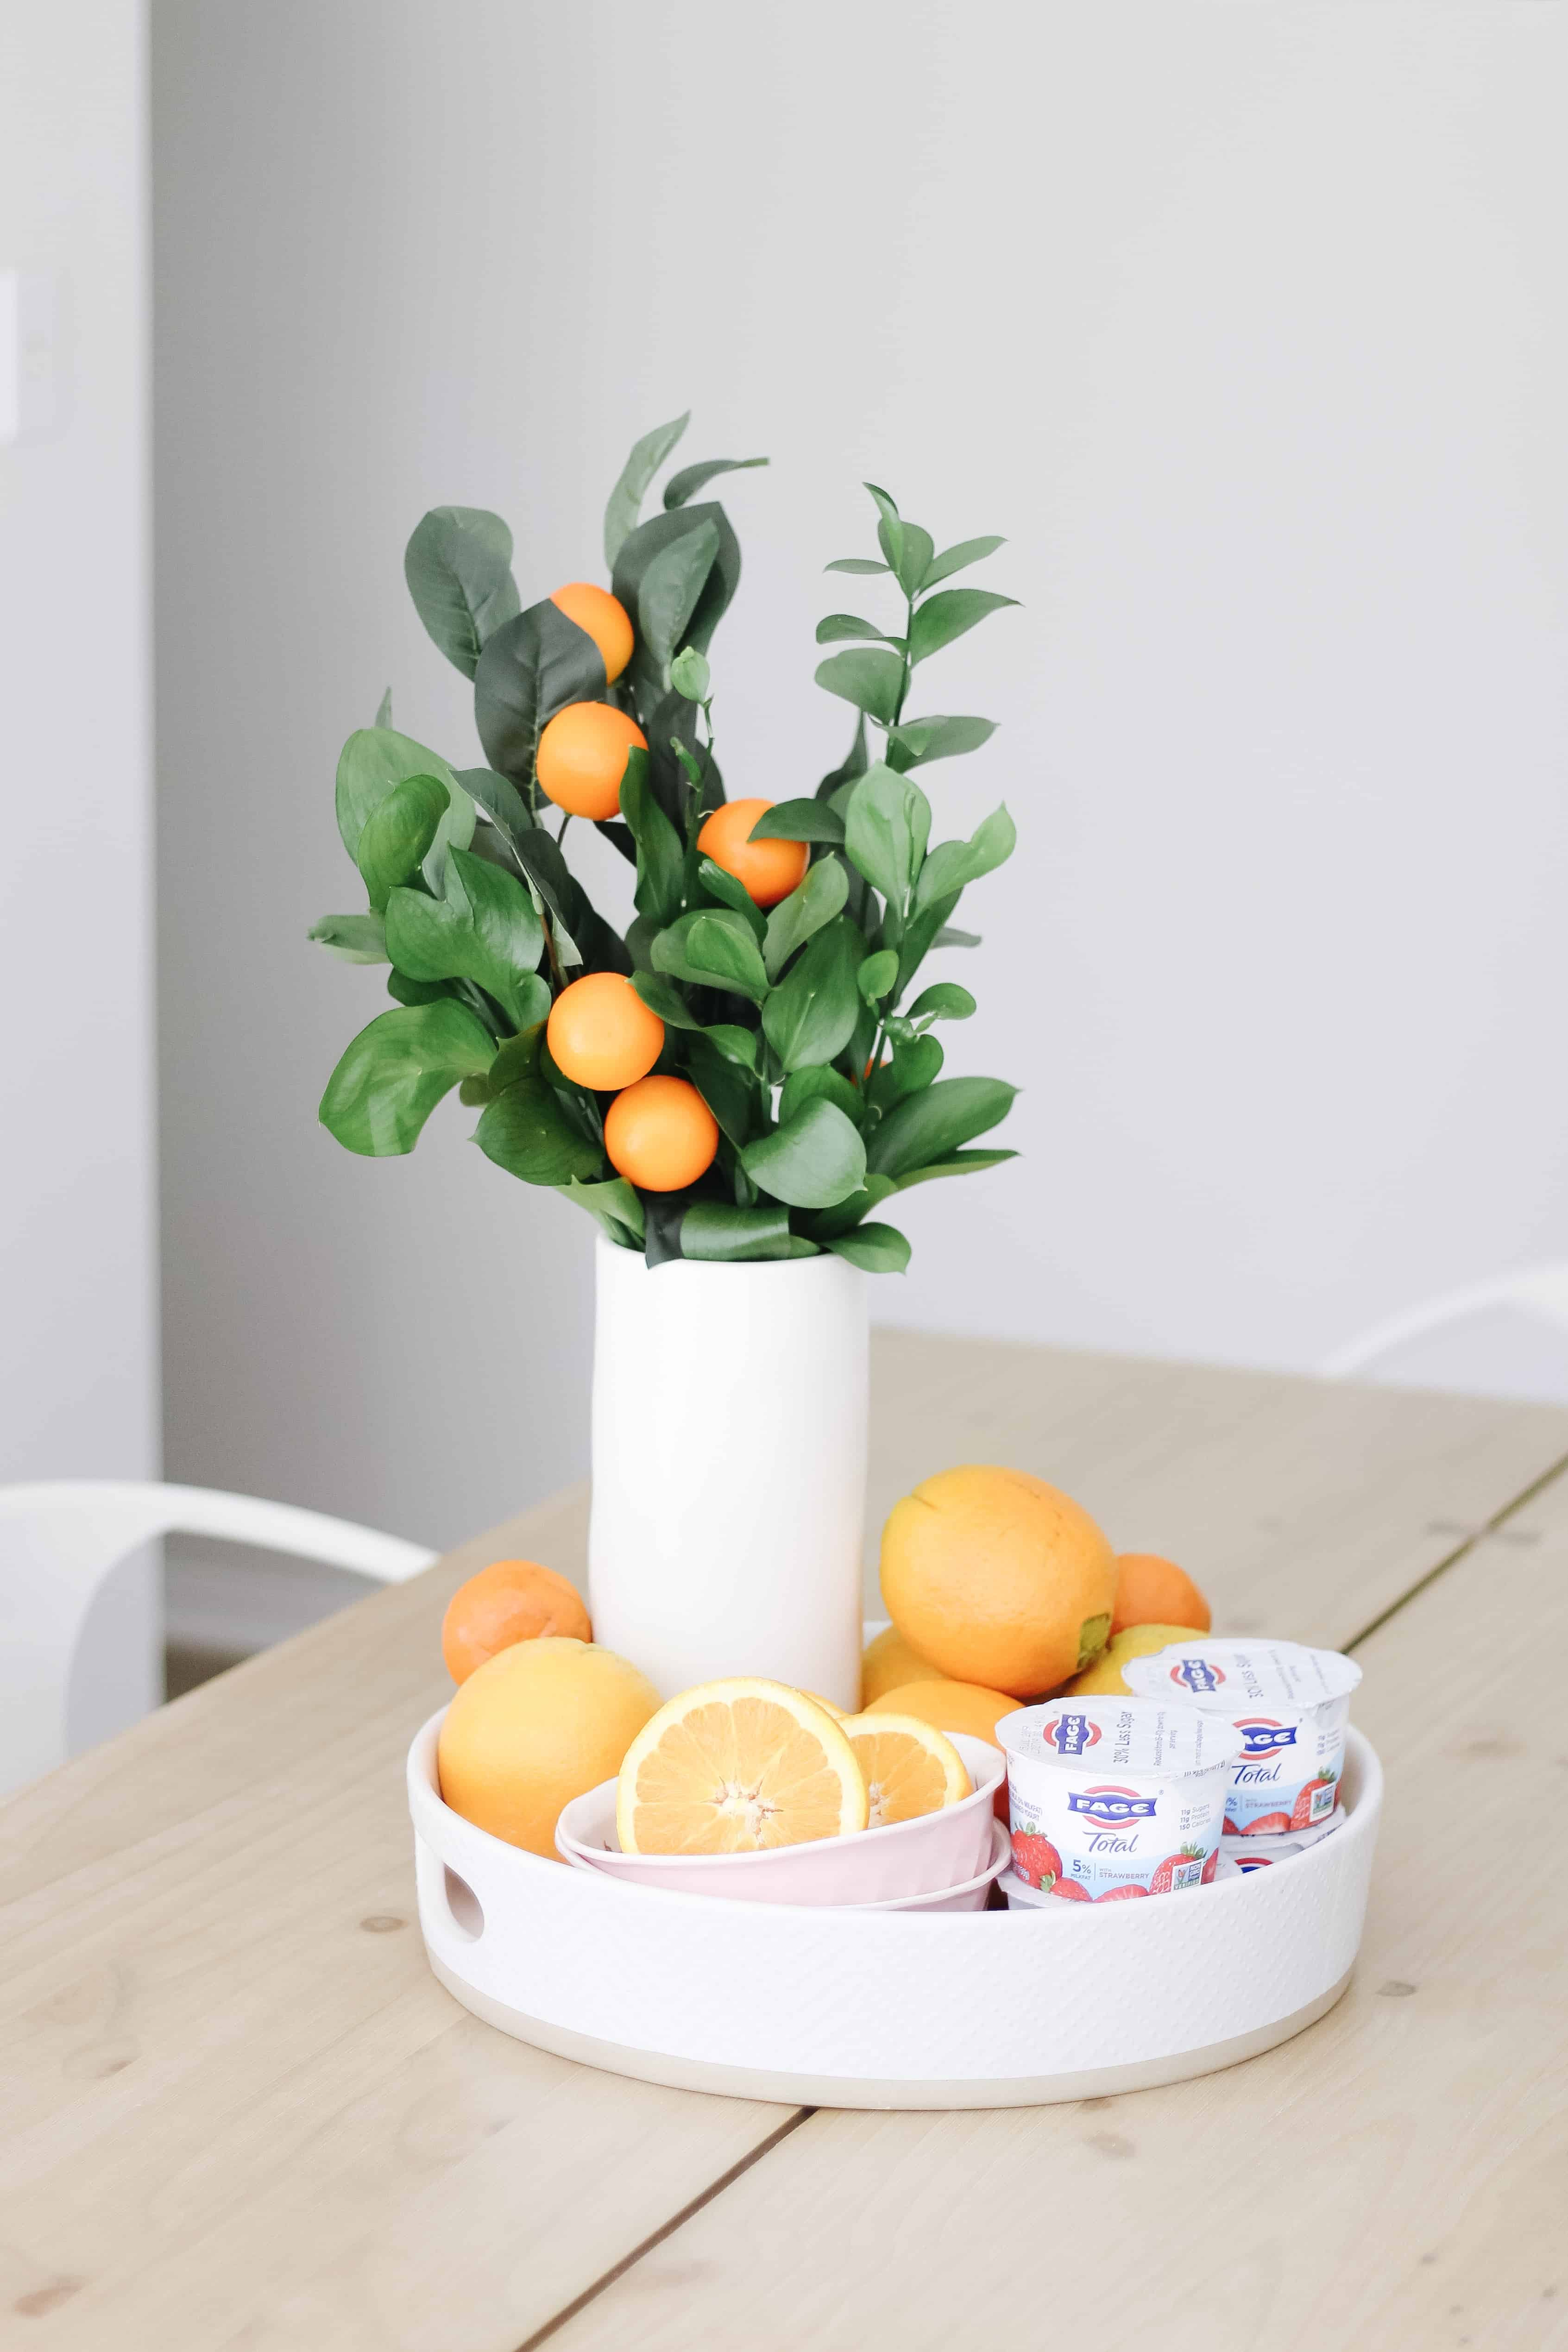 Fage yogurt and oranges in vase